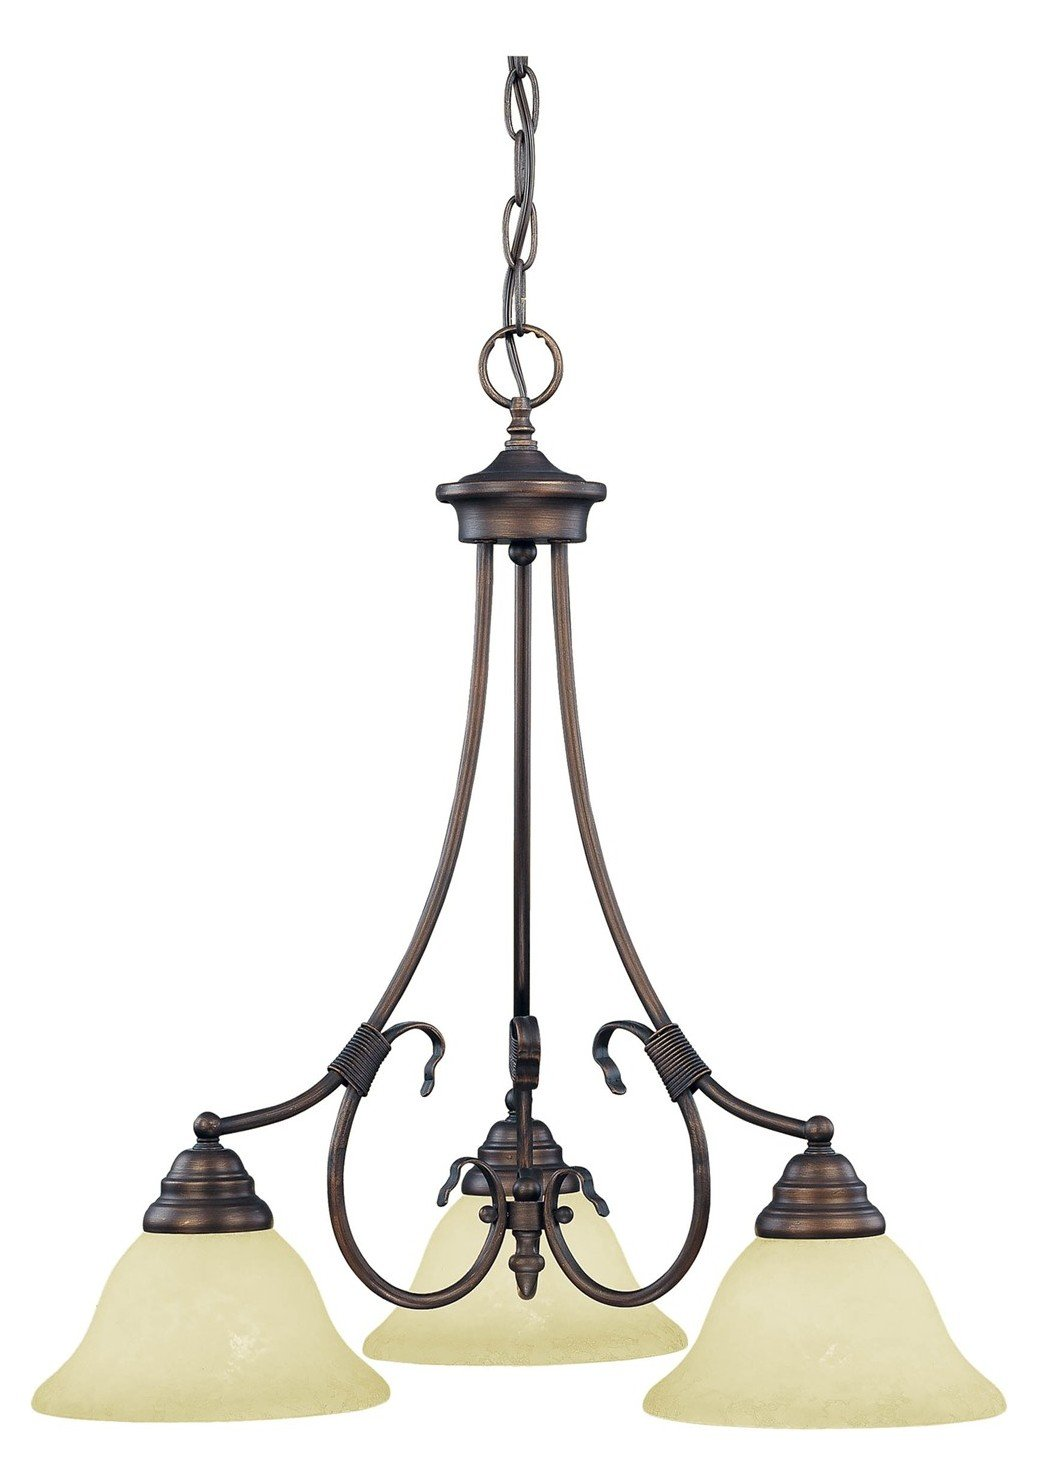 Amazon.com: Lámpara de techo de lámpara de araña.: Home ...